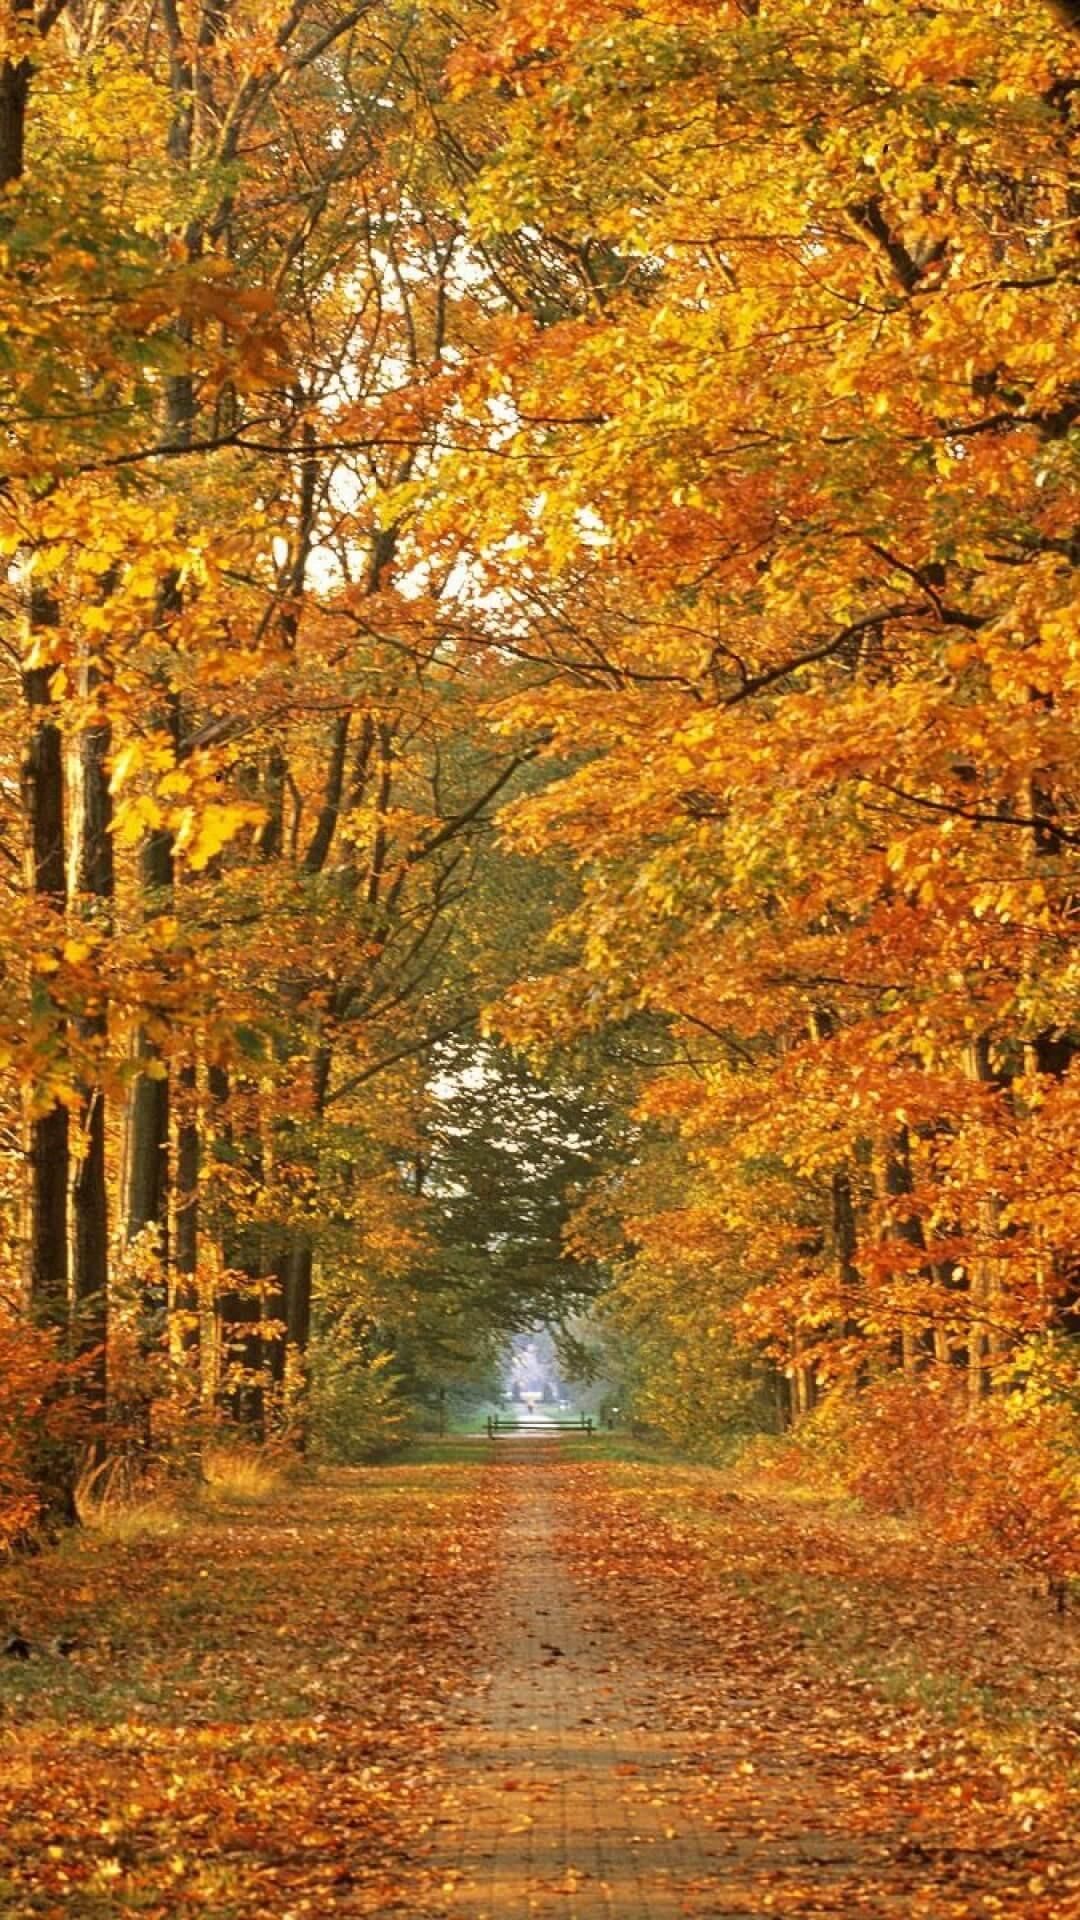 HD 1080p Fall Wallpaper (79+ images)